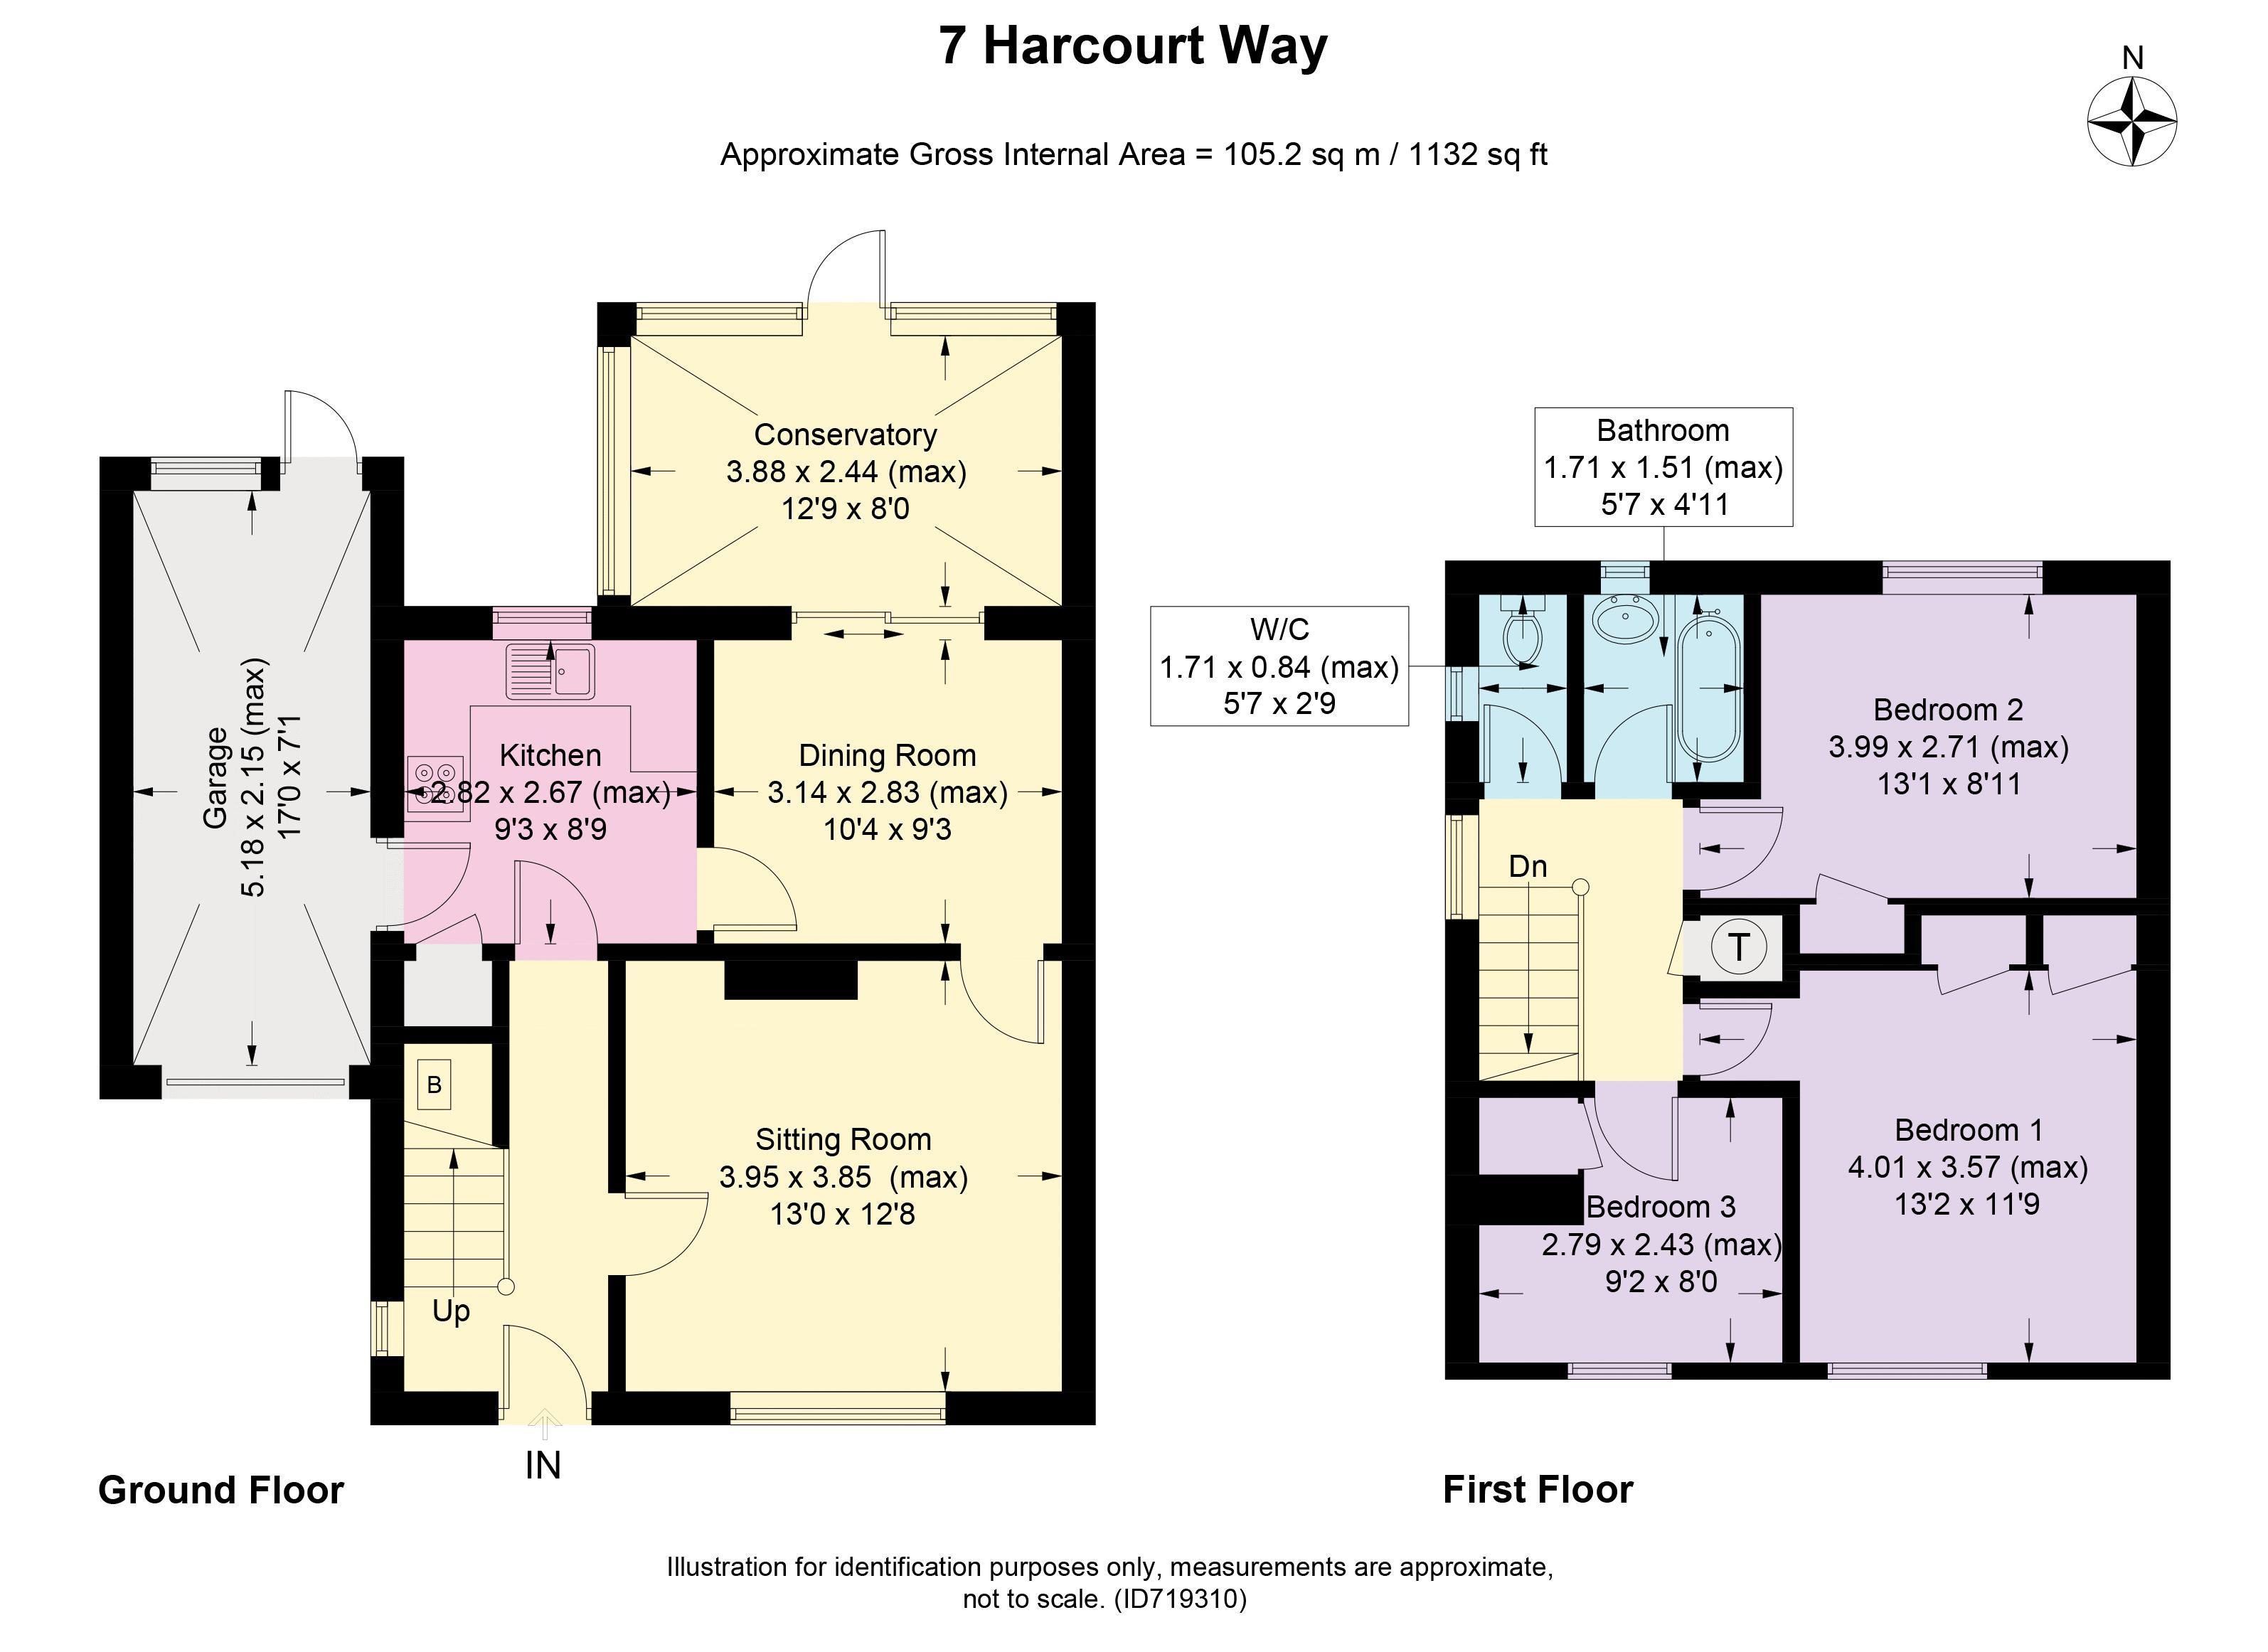 Harcourt Way